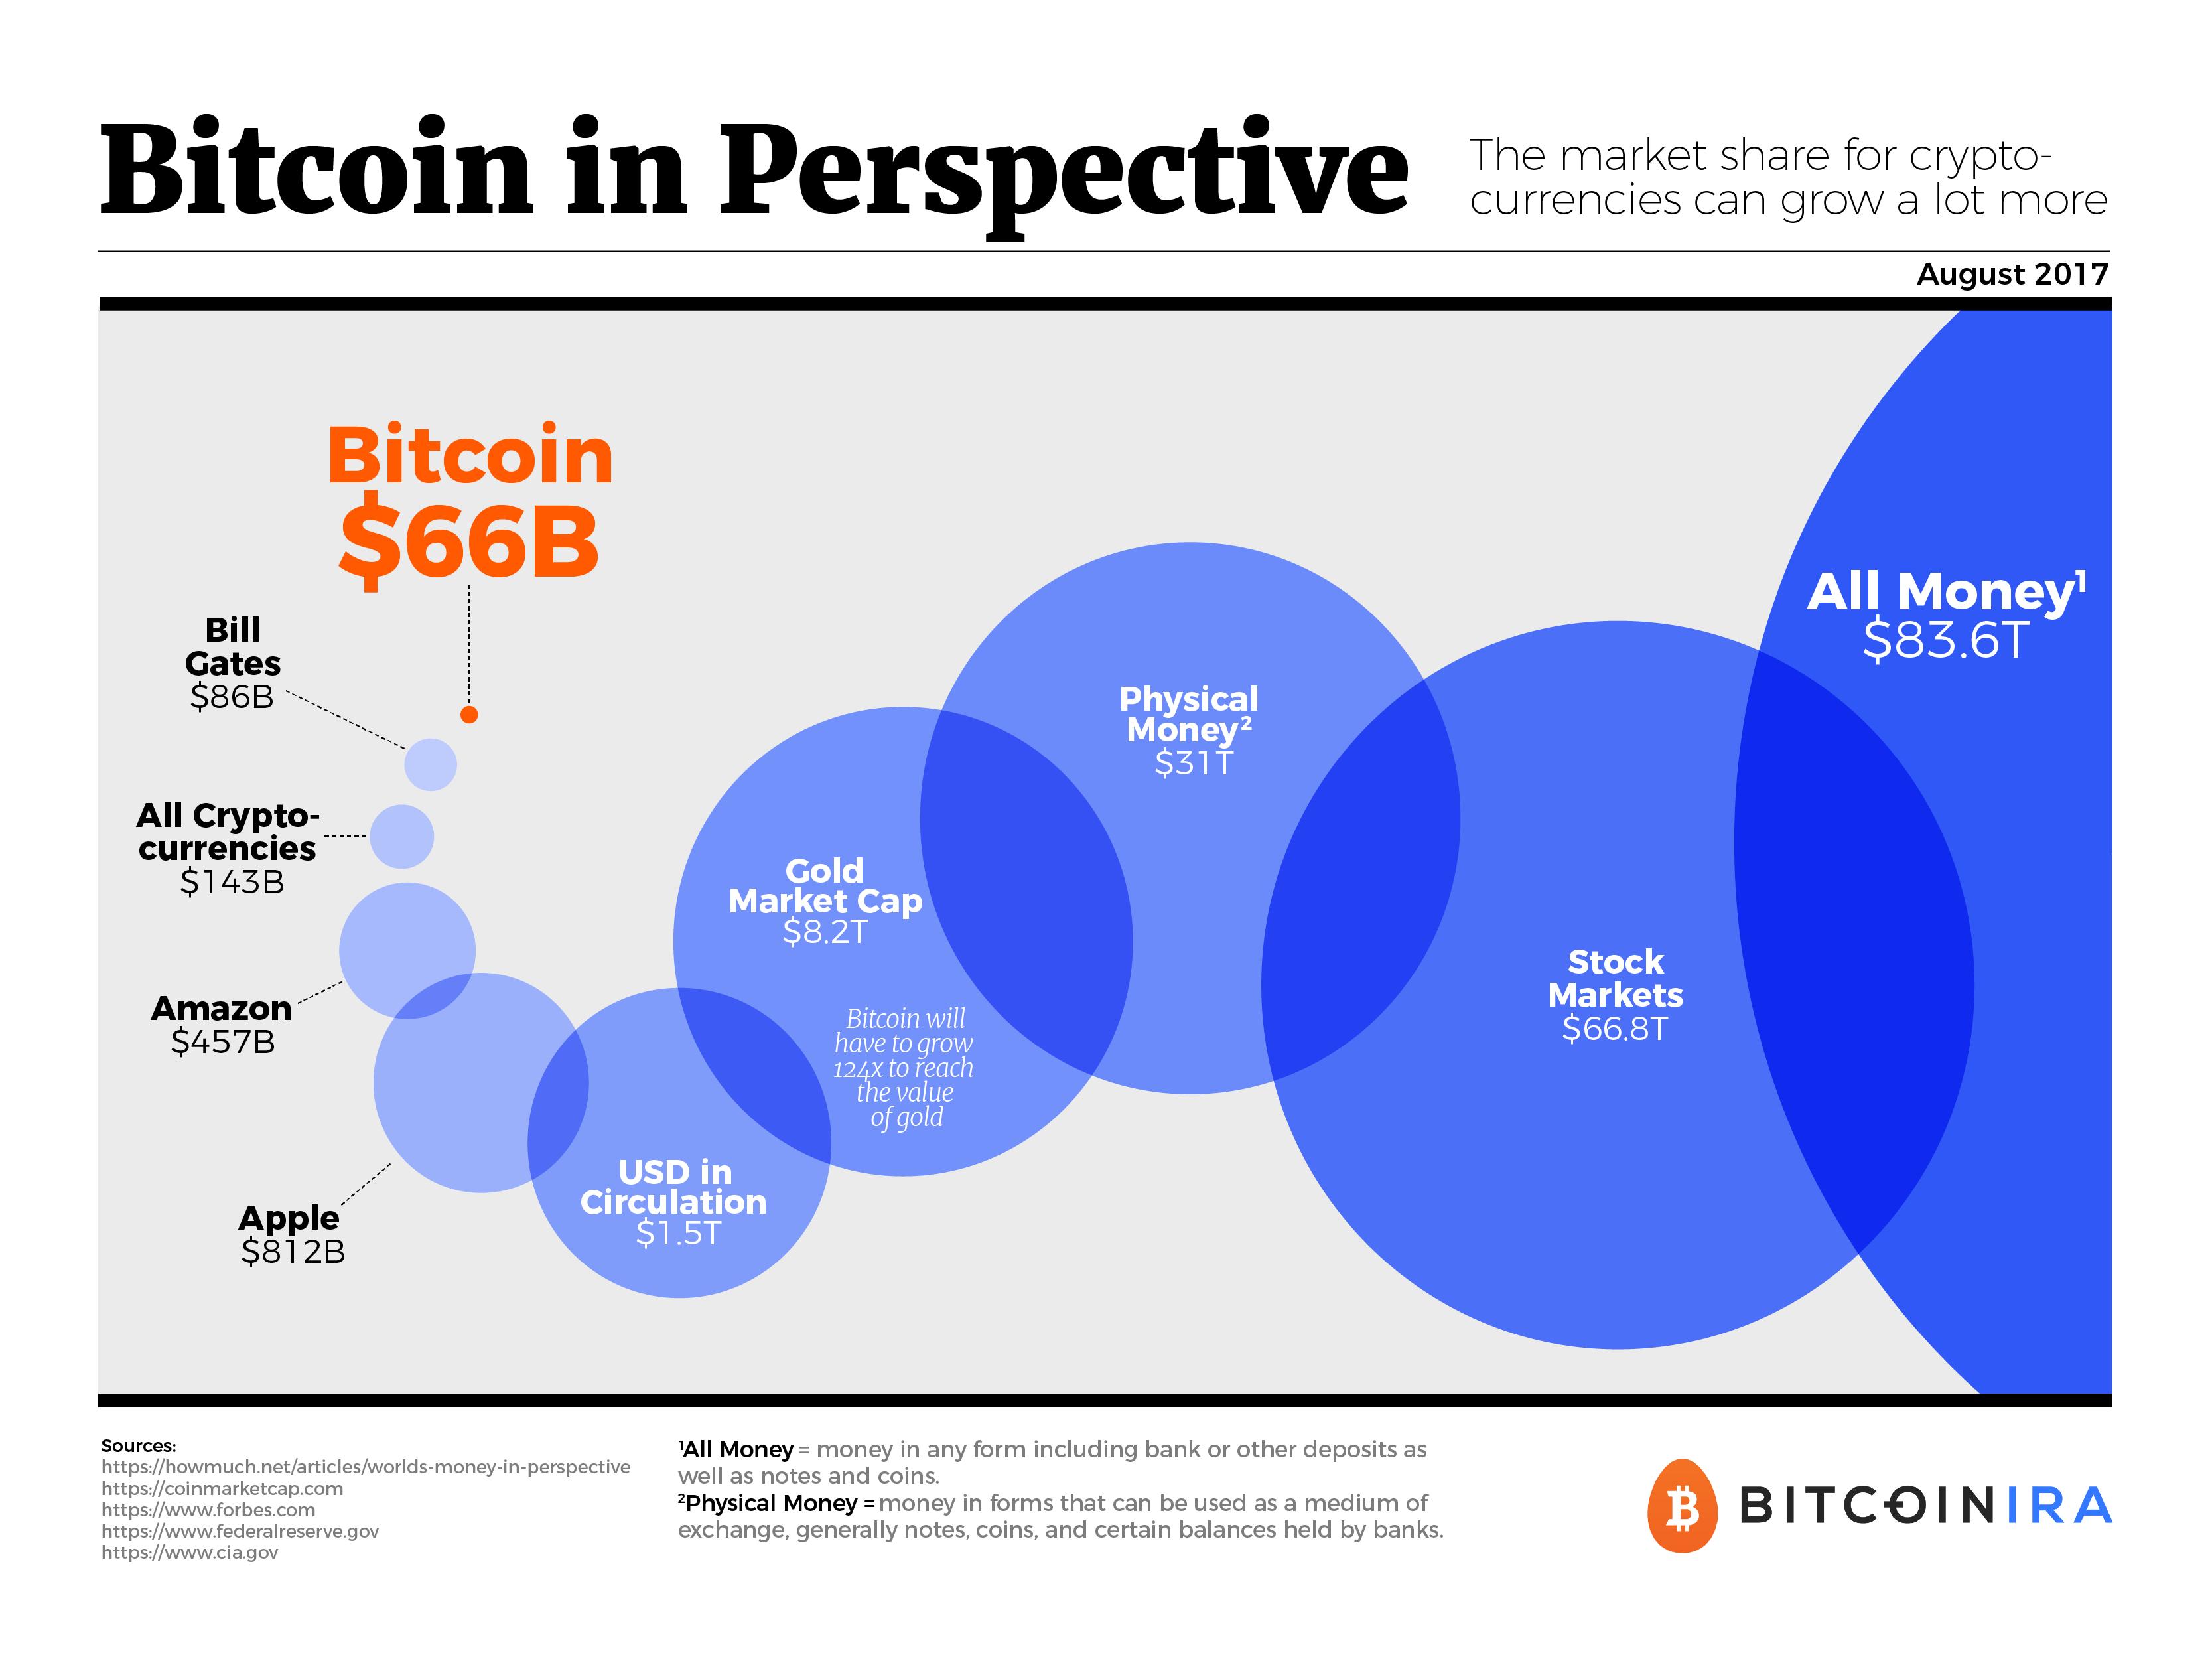 sklypai pirkti bitcoin su kredito kortele